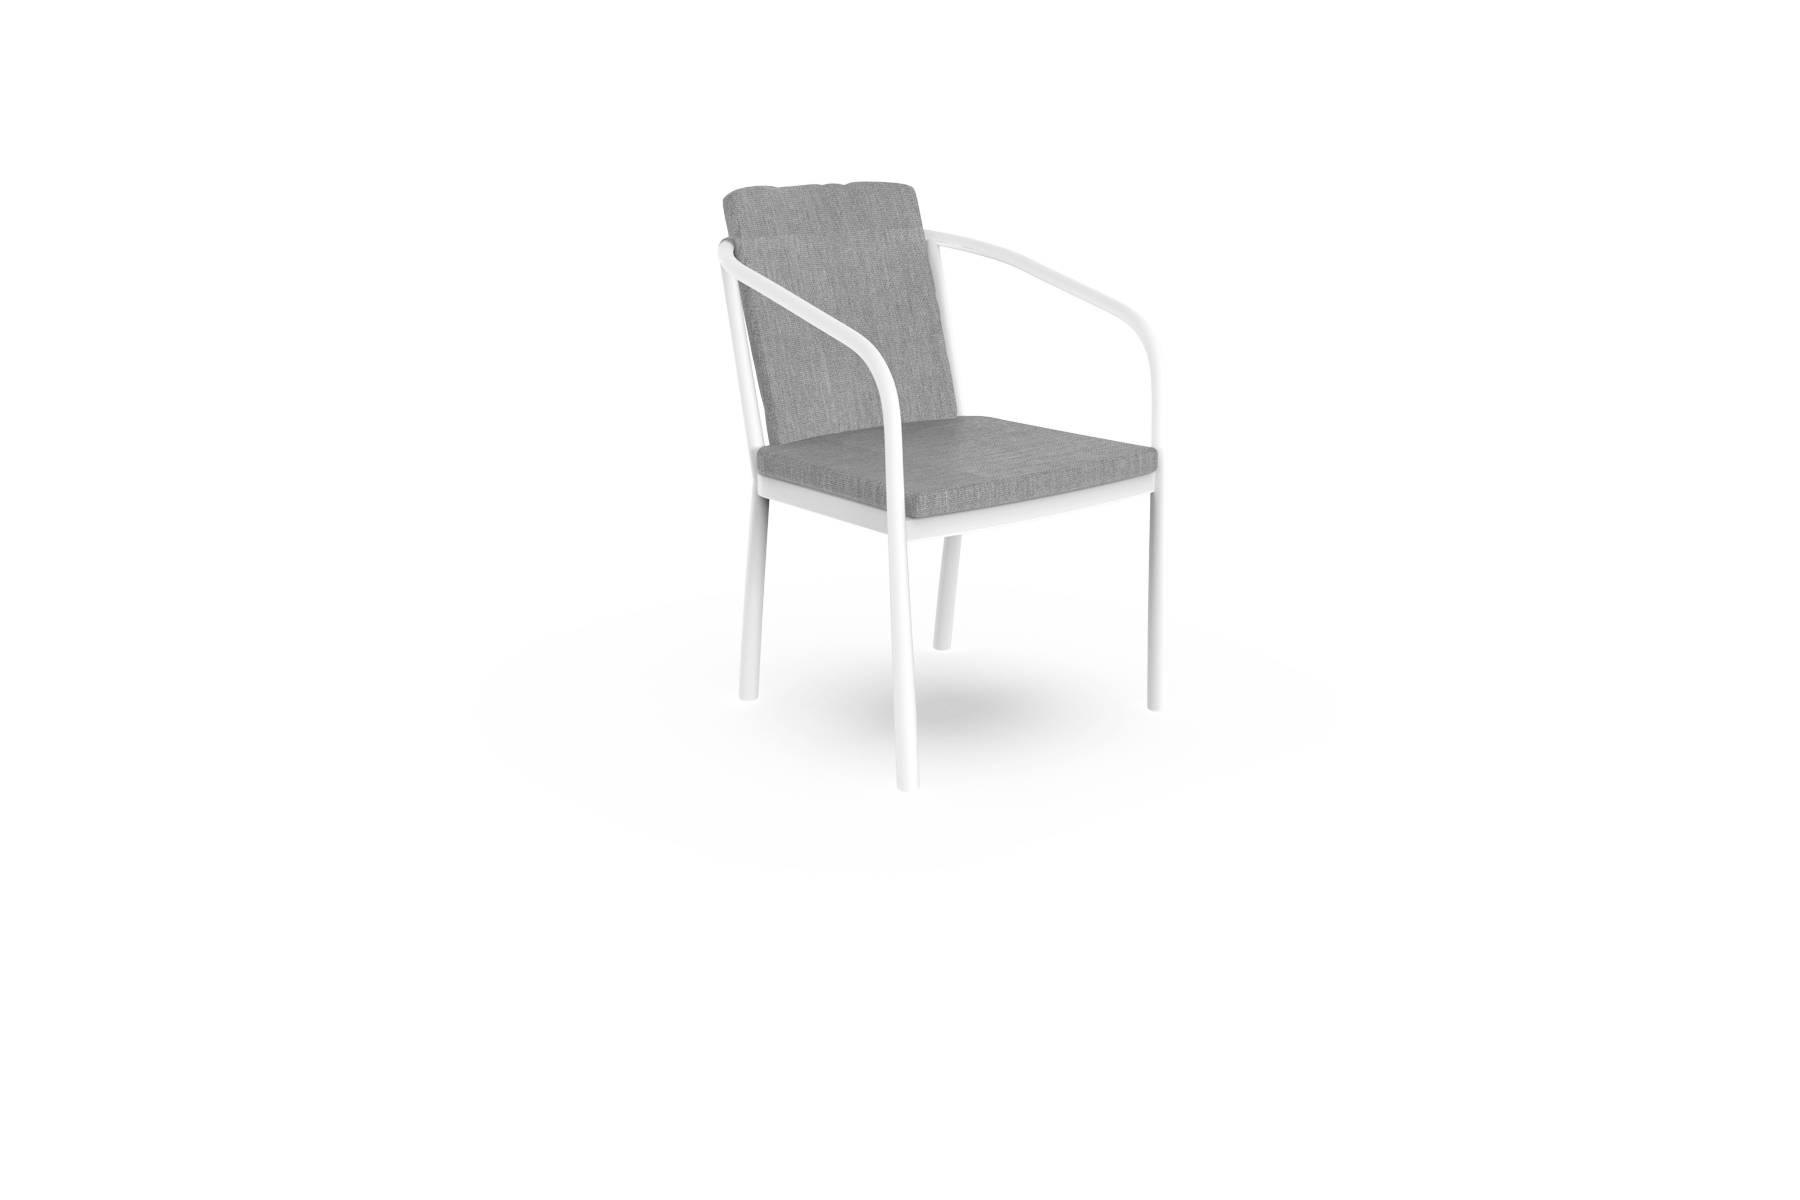 Sofy Dining armchair